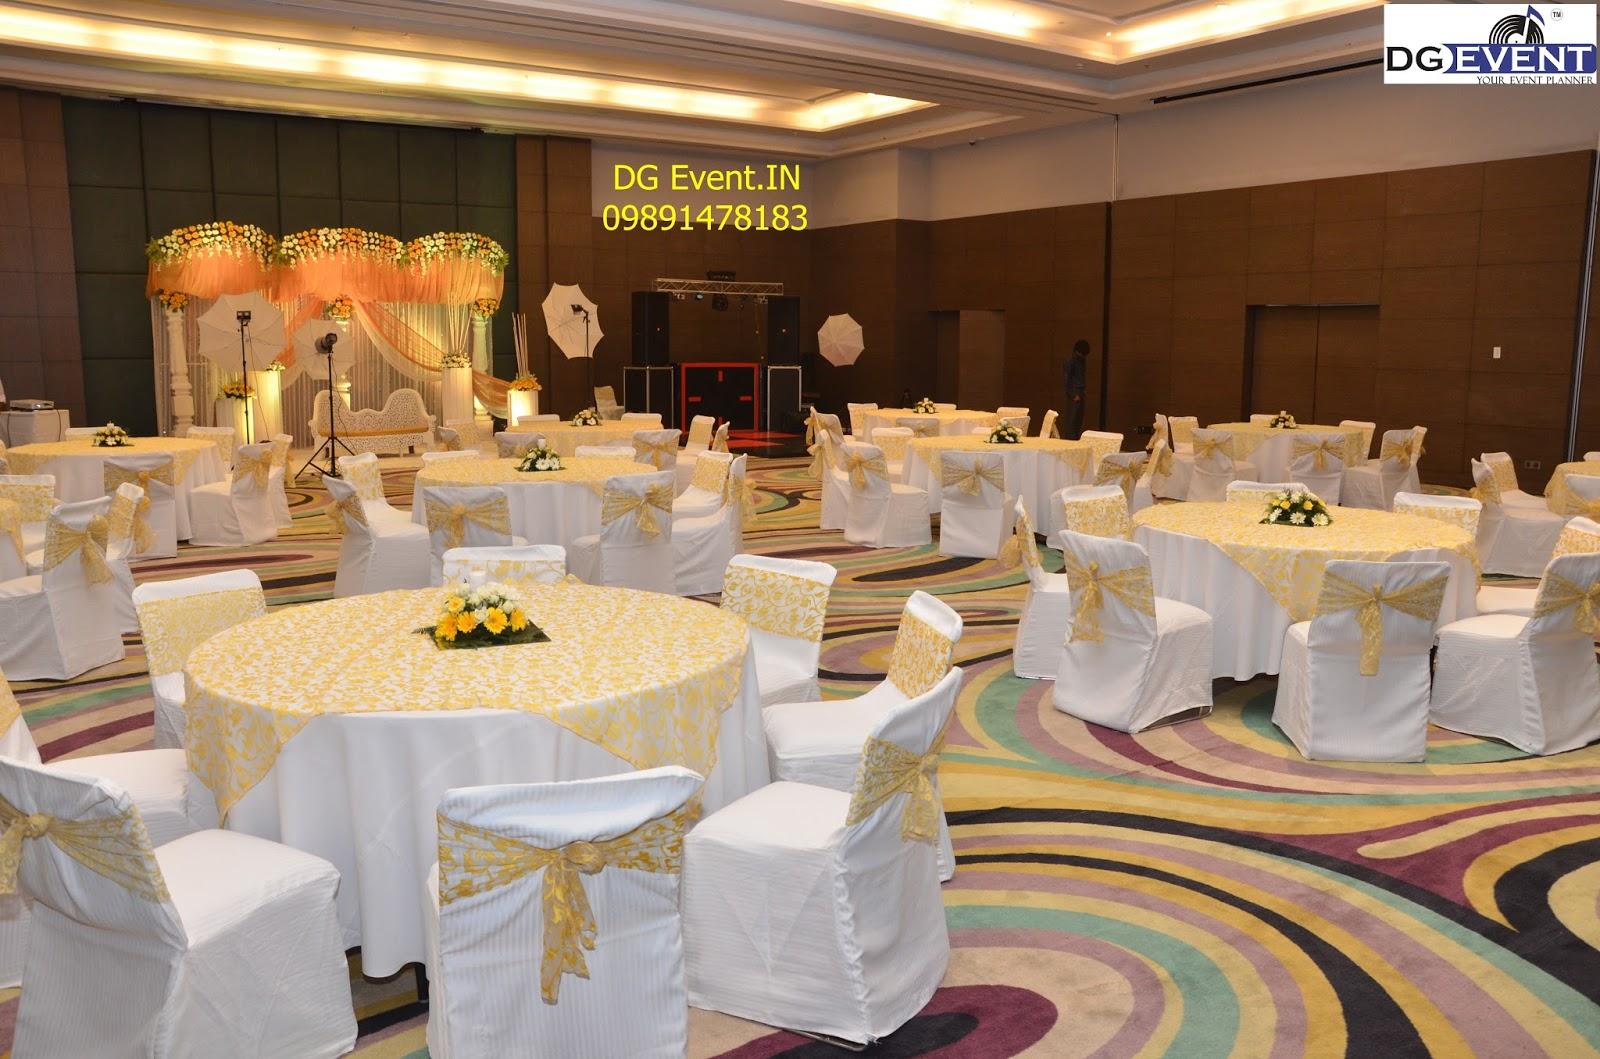 Wedding Ideas On A Budget 58 Epic th wedding anniversary party